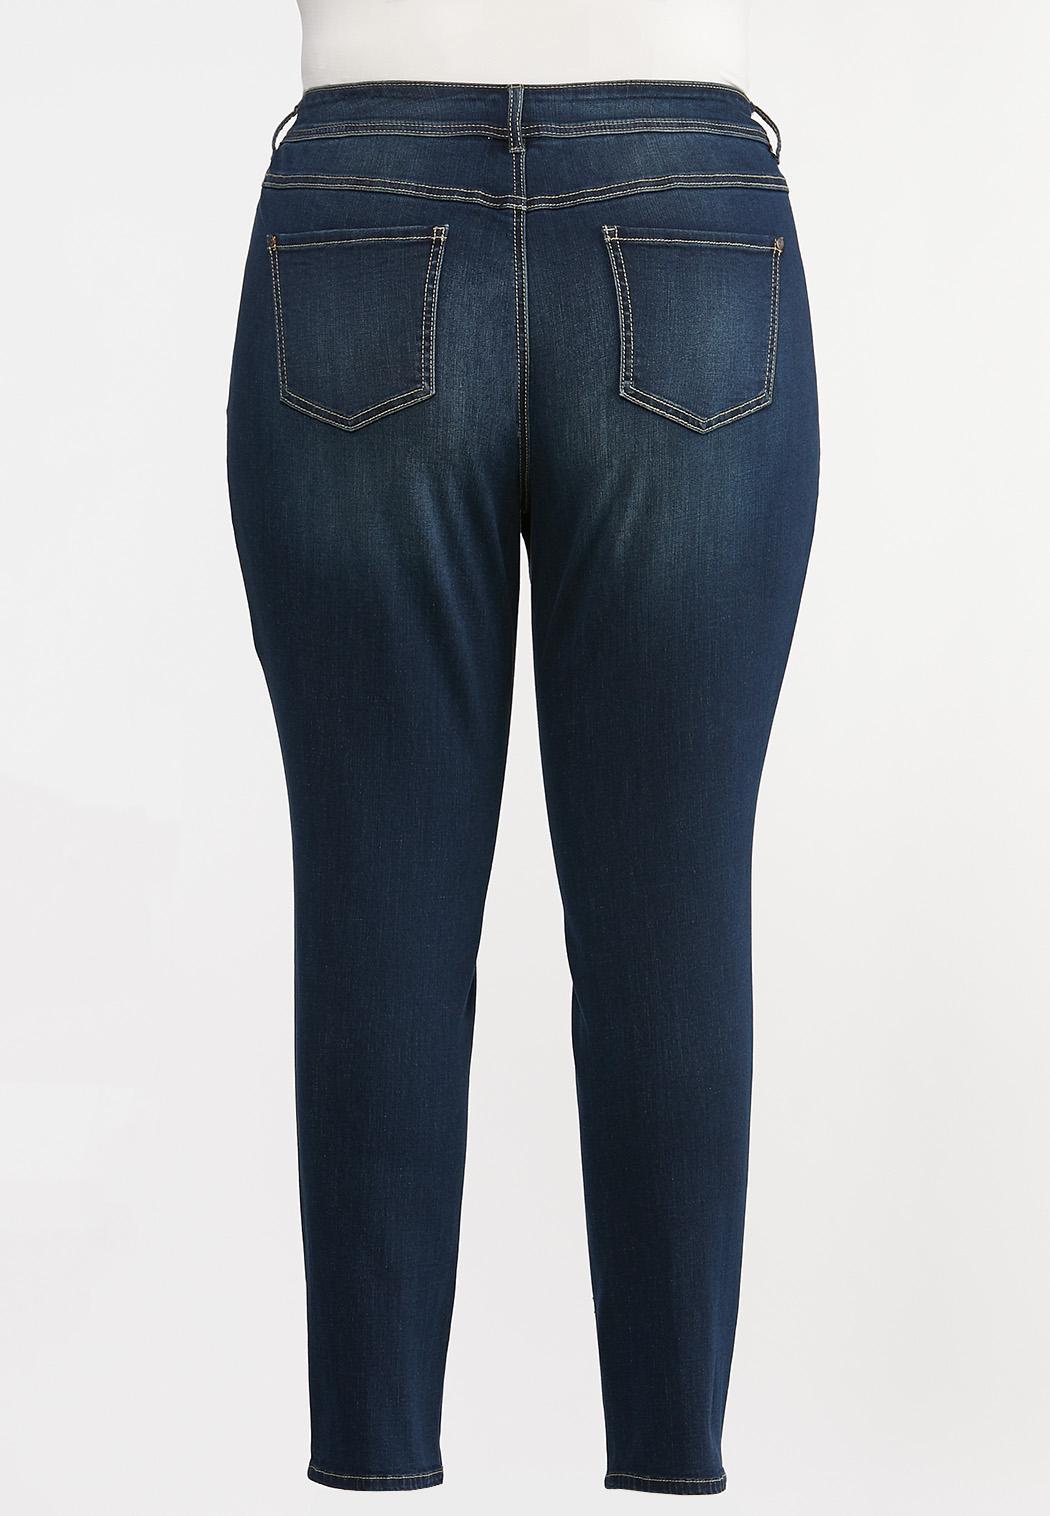 Plus Petite Curvy Skinny Jeans (Item #44333555)